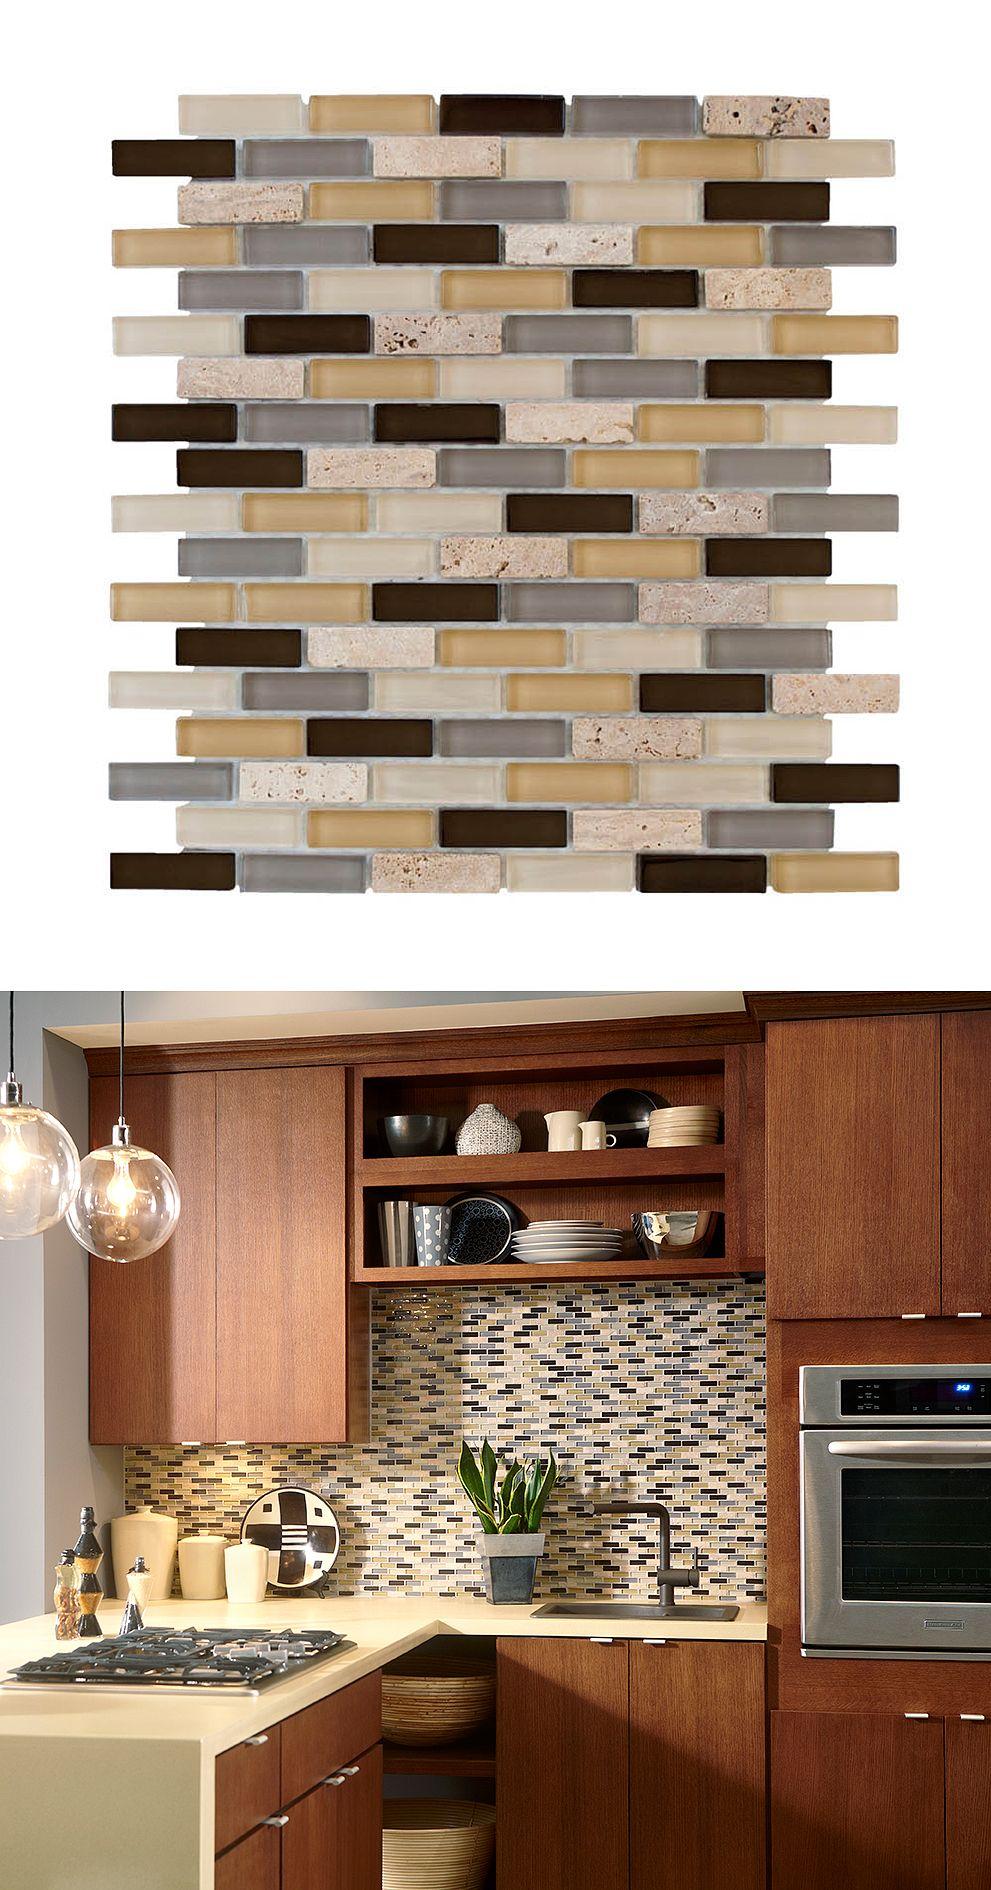 jeffrey court castle stone brick 12 in x 12 in x 8 mm glass travertine mosaic wall tile - Glass Tile Castle Ideas